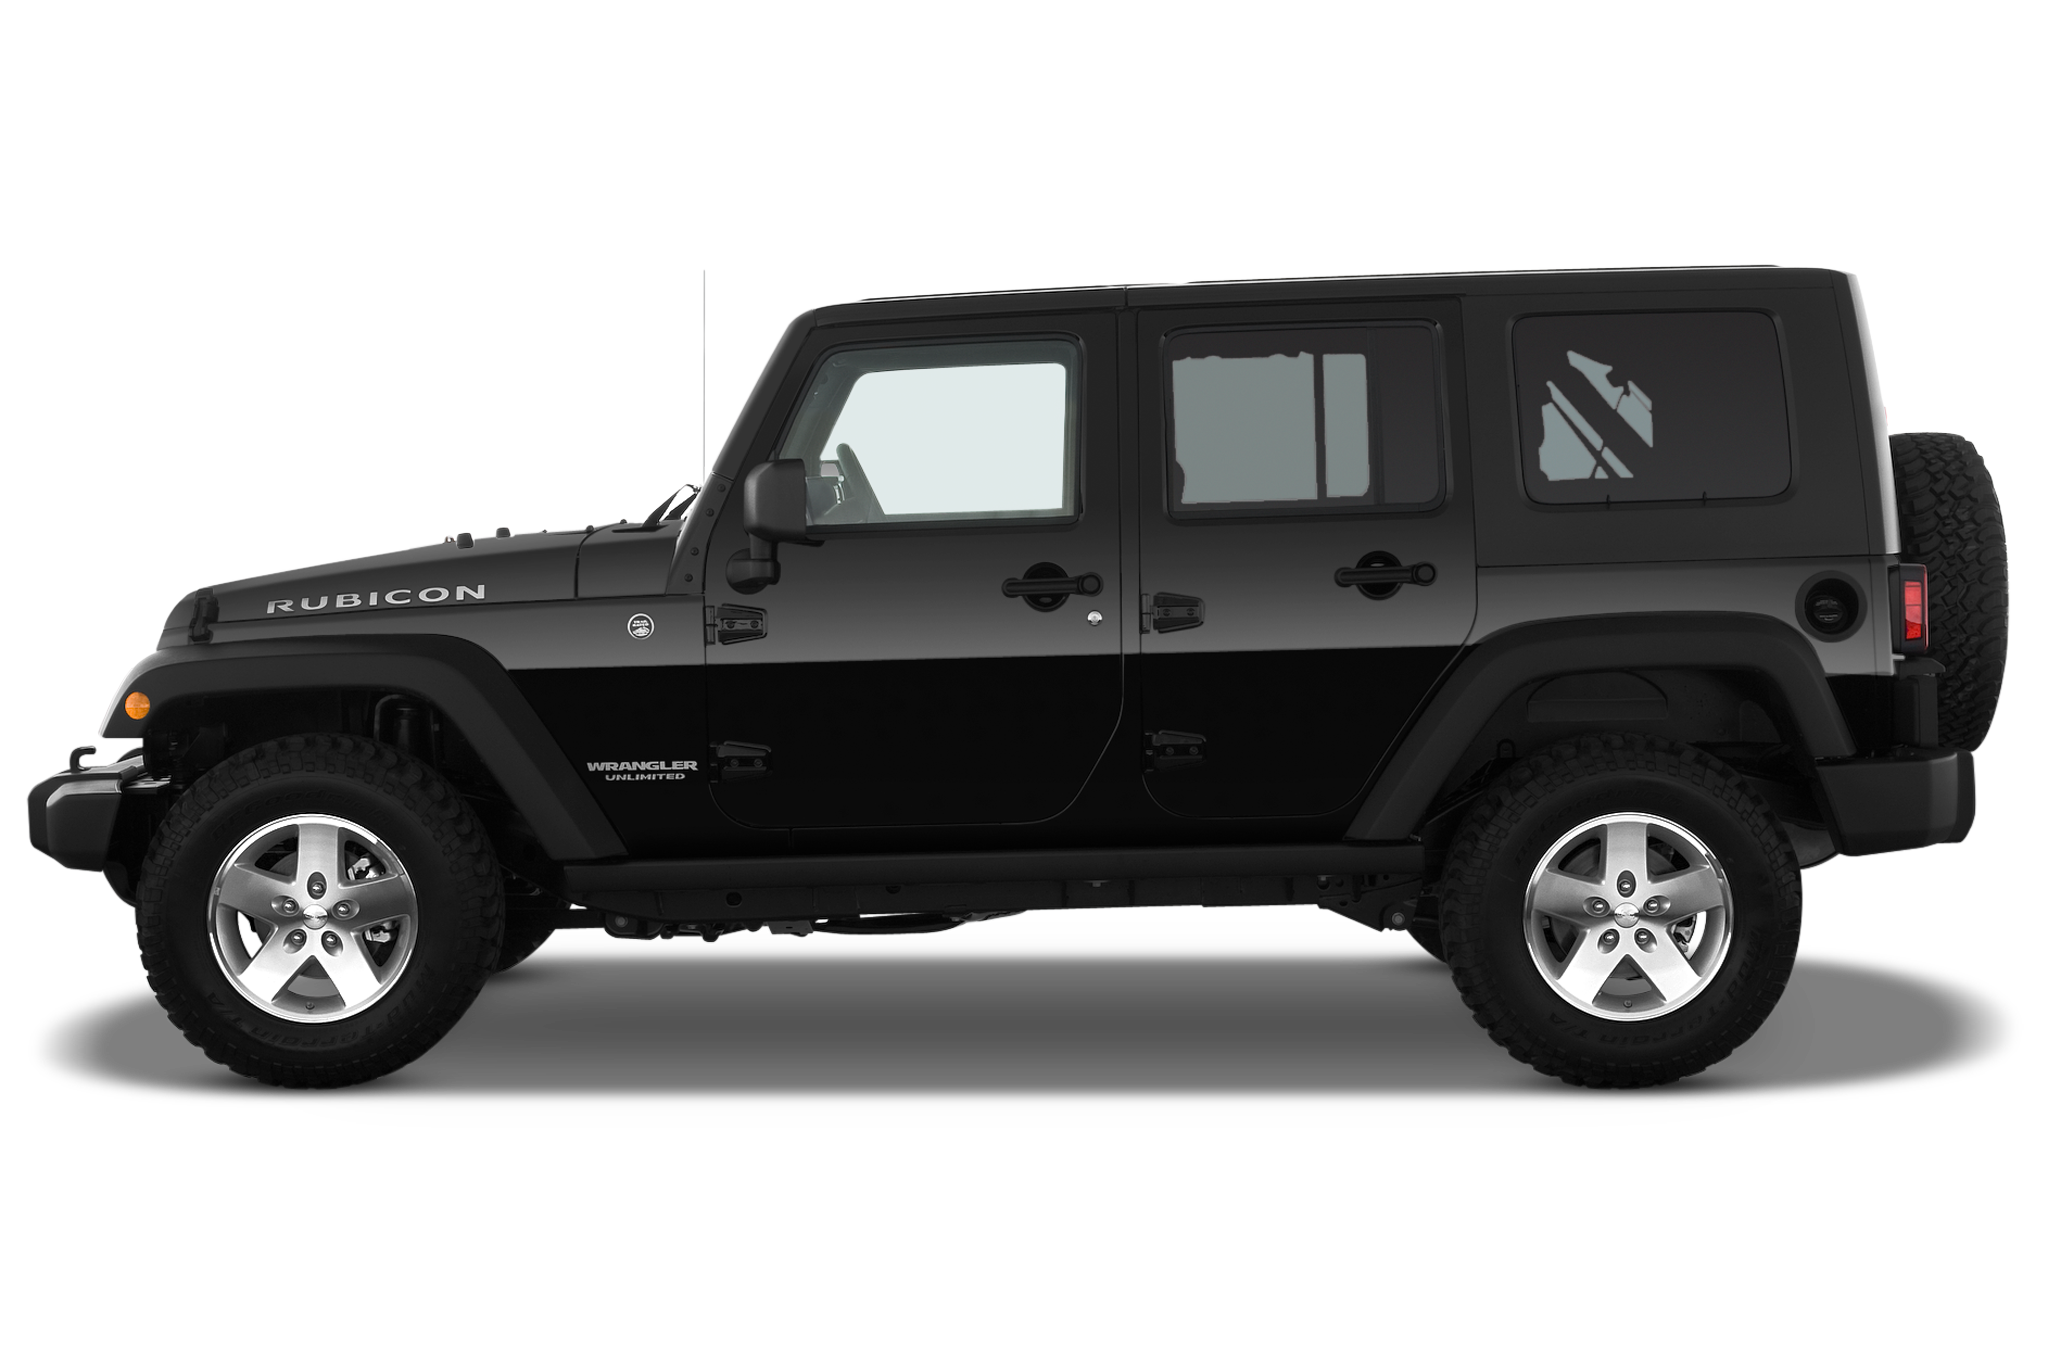 2010 jeep wrangler unlimited ev 2009 detroit auto show. Black Bedroom Furniture Sets. Home Design Ideas